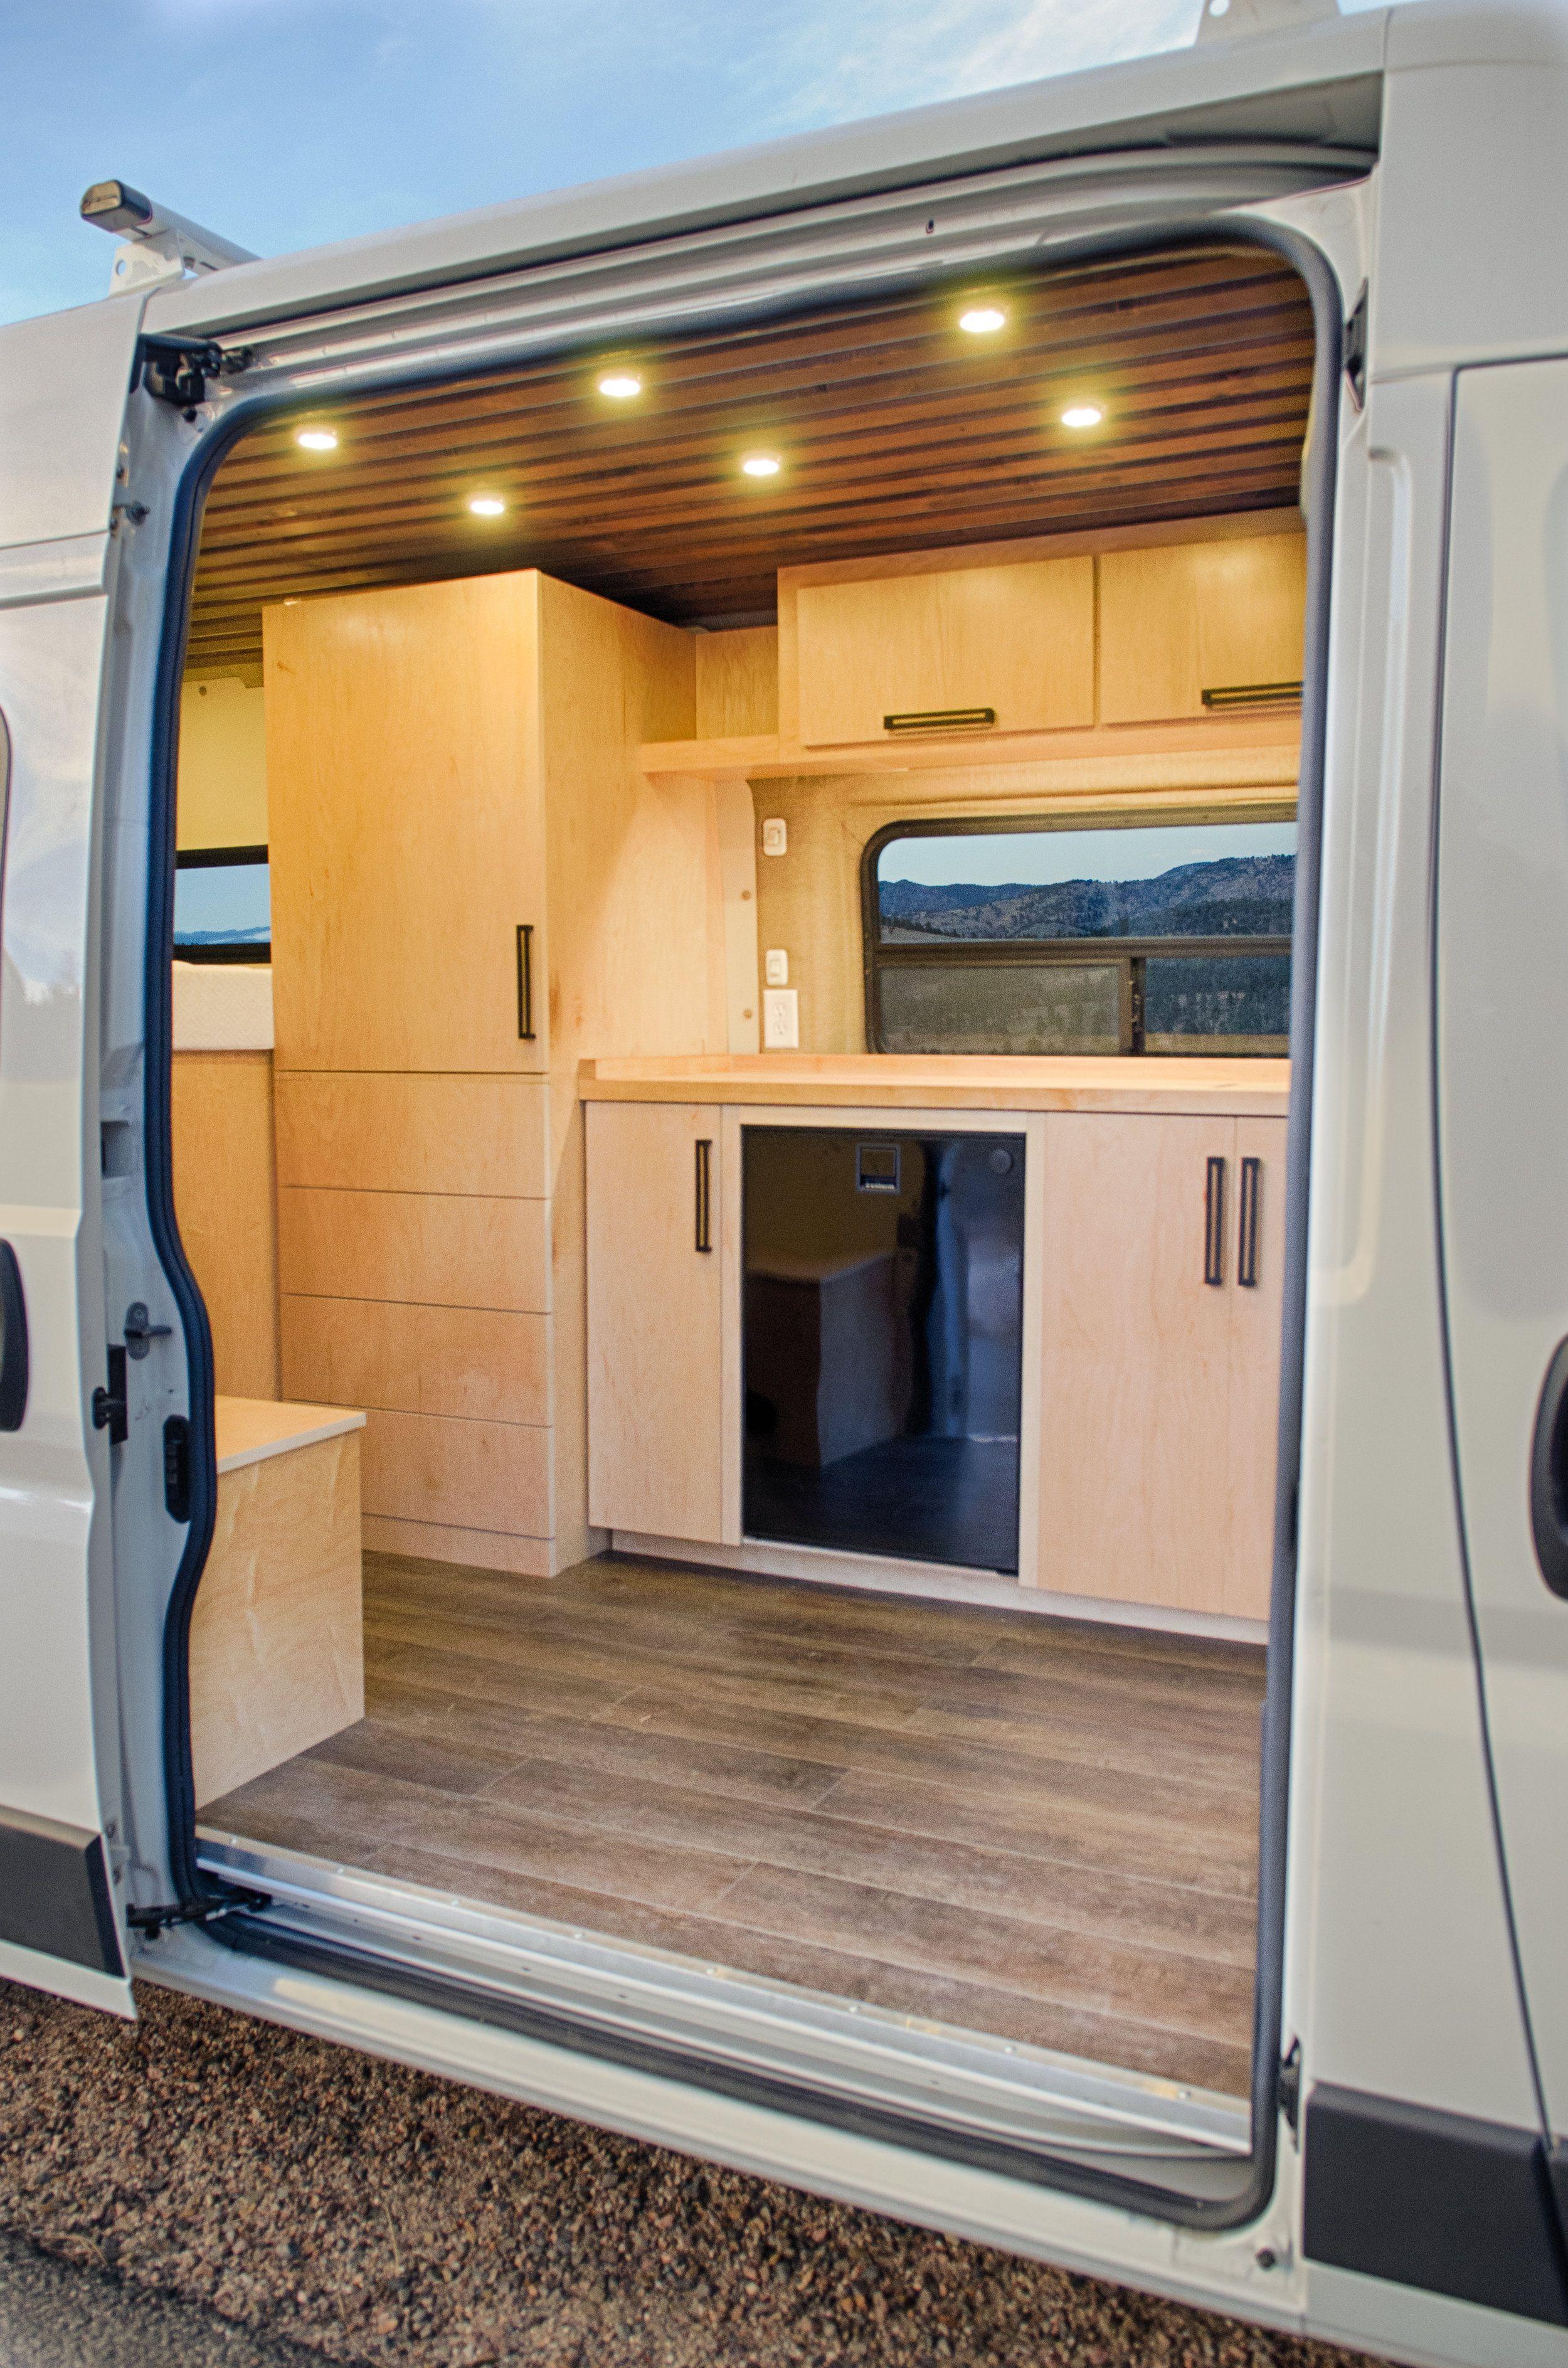 The Stained Slatted Ceiling Maple Cabinetry Pulls Handles And Engineered Wood Floor Were Spec Mit Bildern Kastenwagen In Wohnmobil Umbau Wohnmobil Umbau Wohnmobilumbau